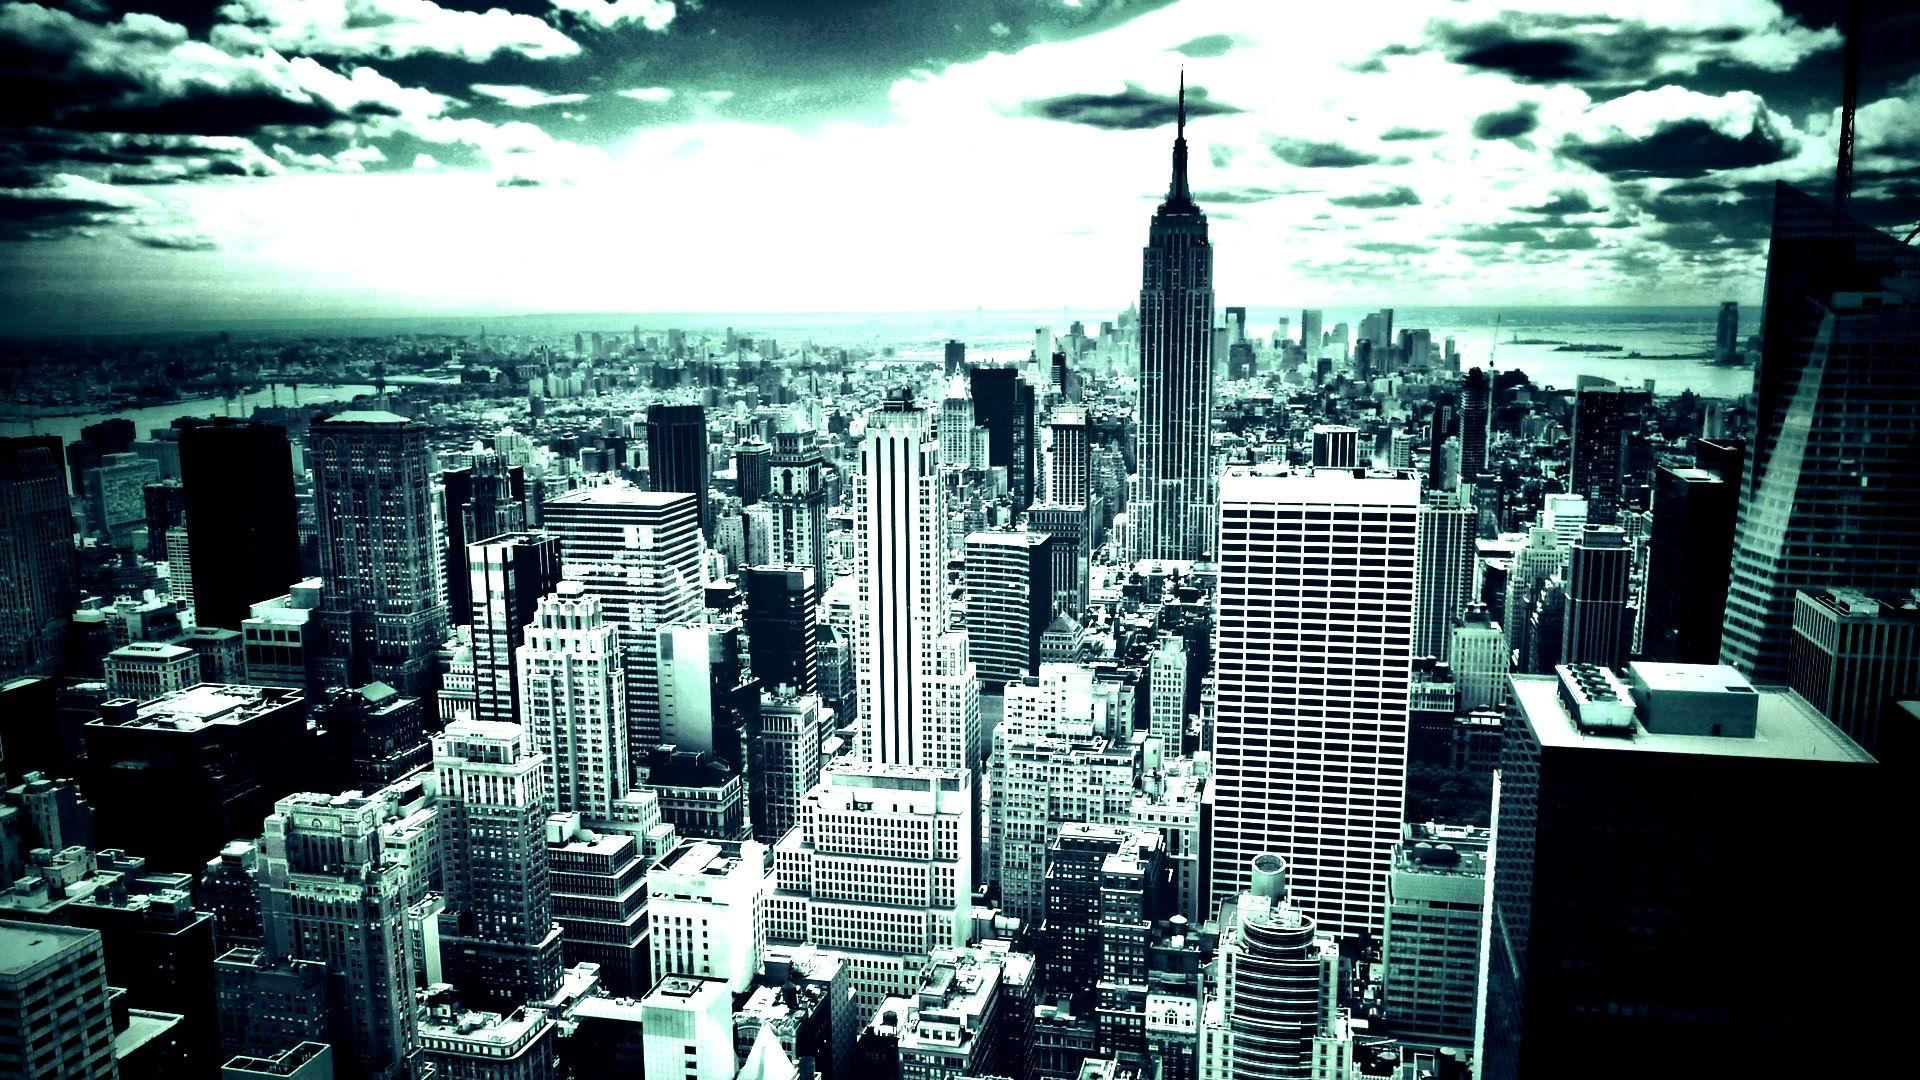 contentuploads201407Cool Wallpapers New York City HD Wallpaperjpg 1920x1080